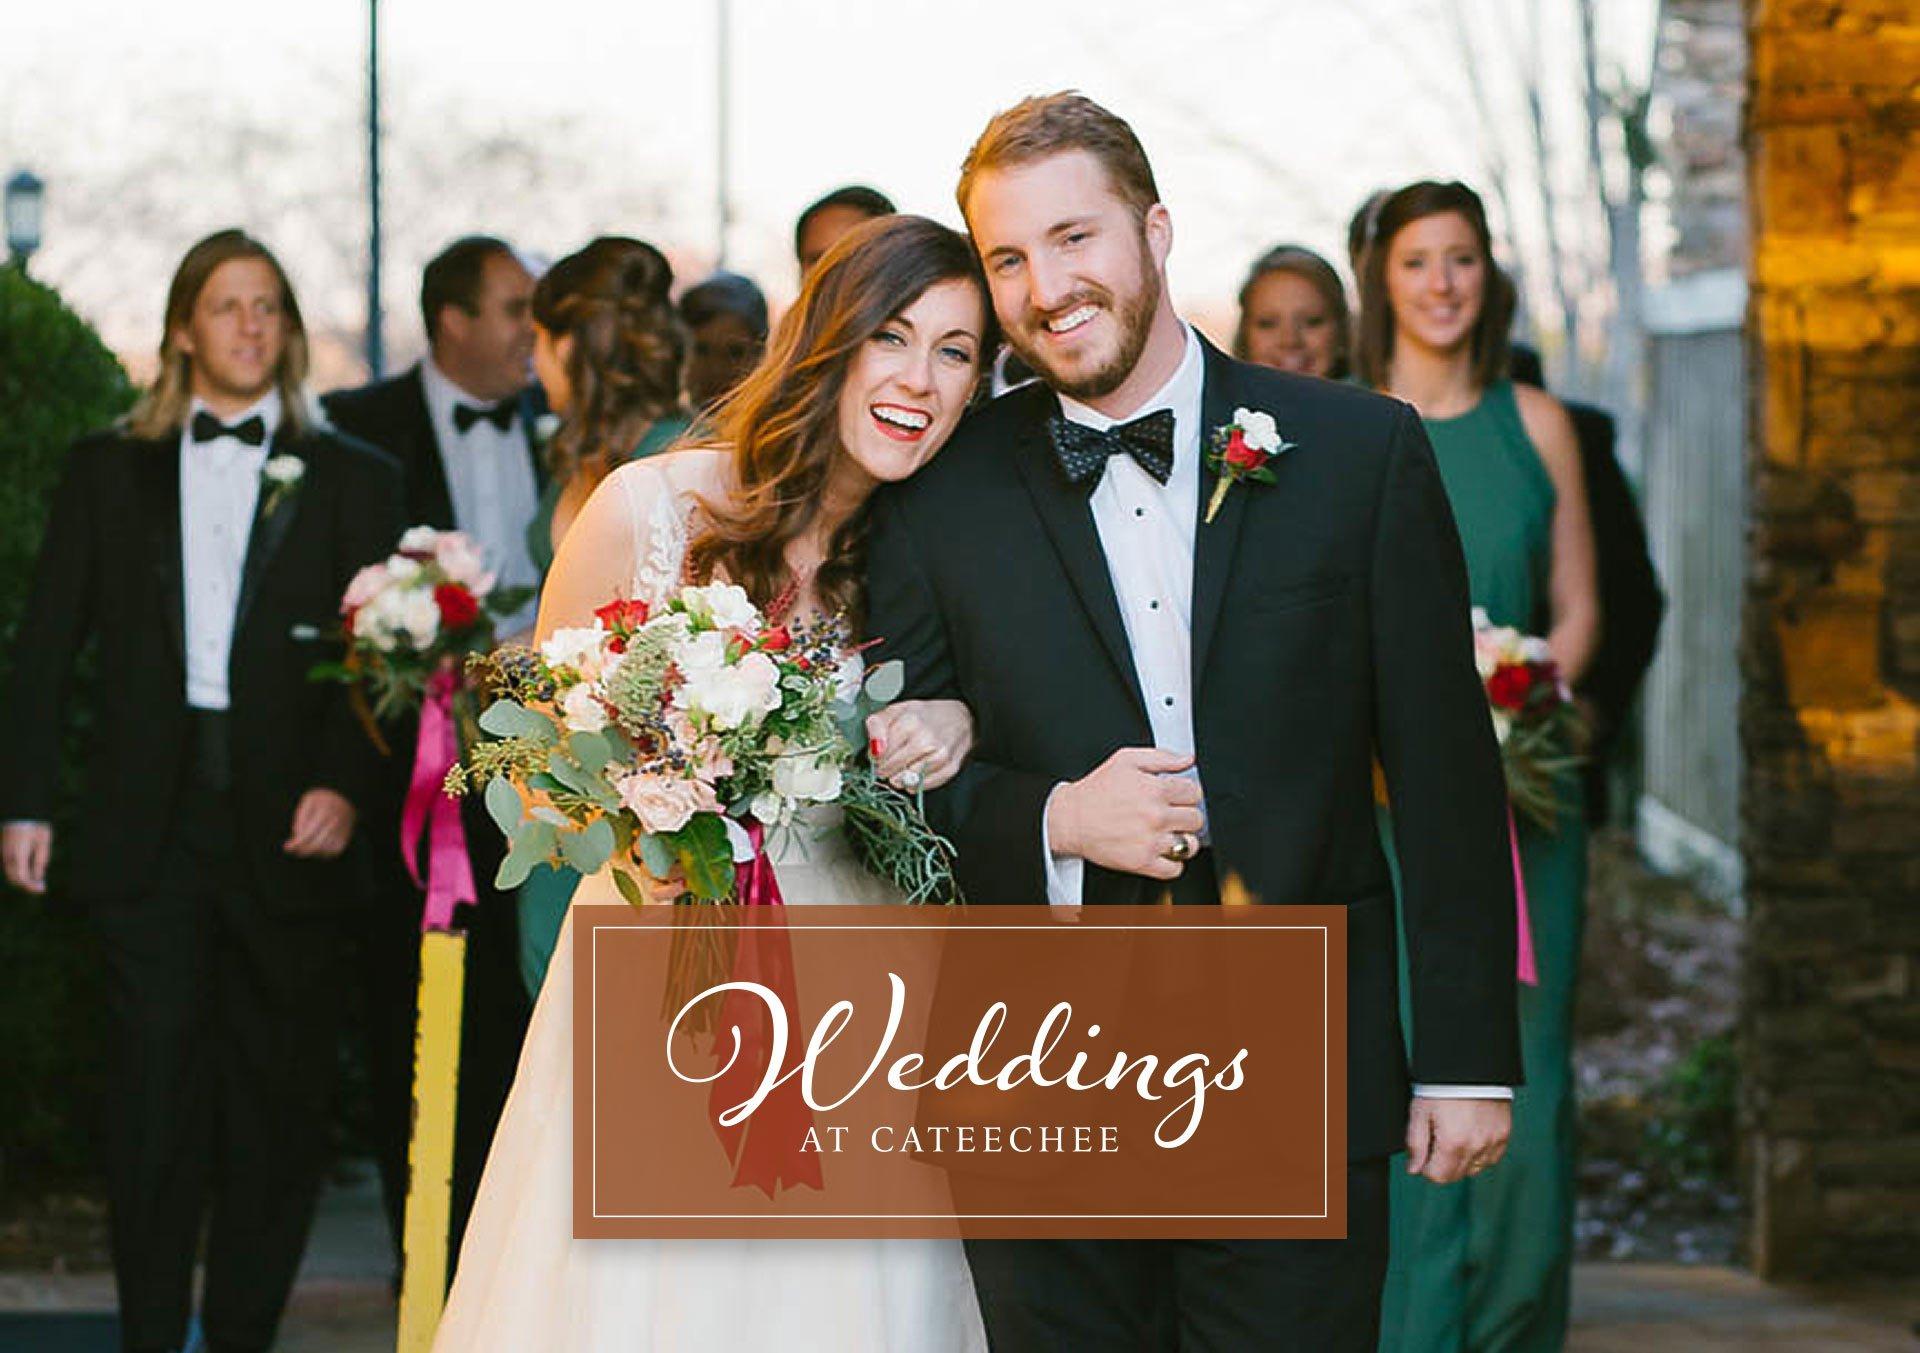 Weddings at Cateechee